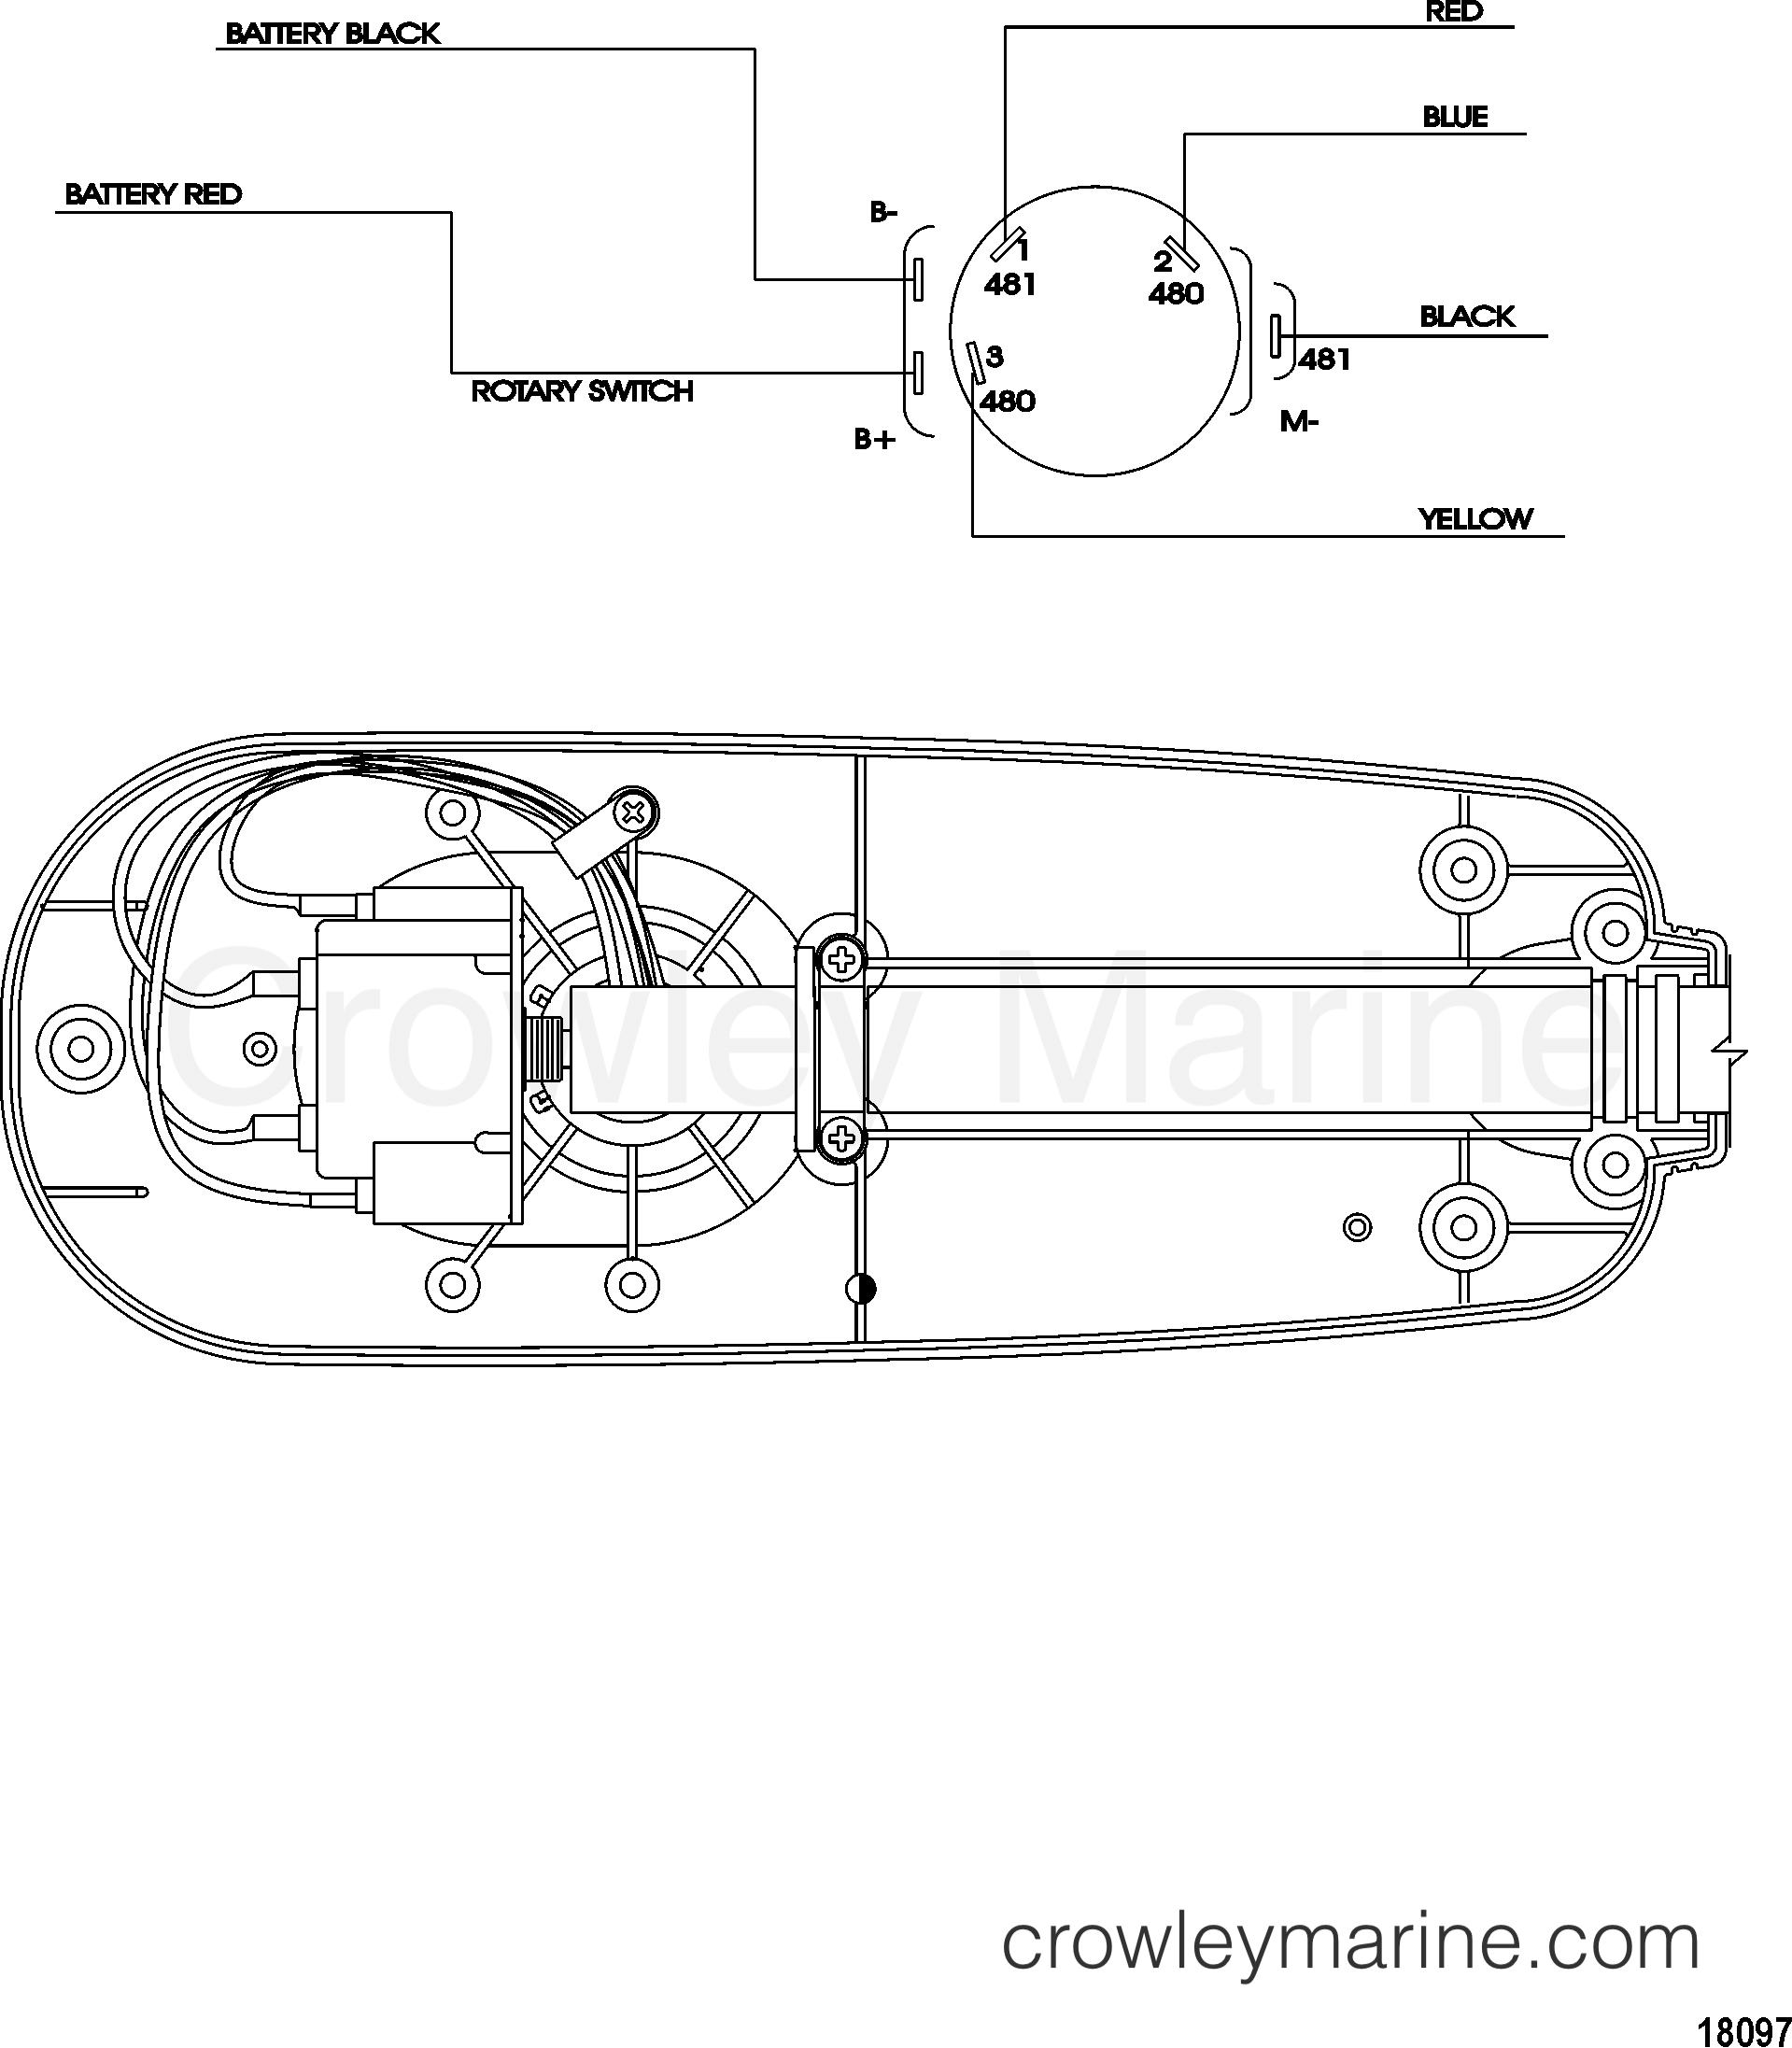 Motorguide 24 Volt Trolling Motor Wiring Diagram